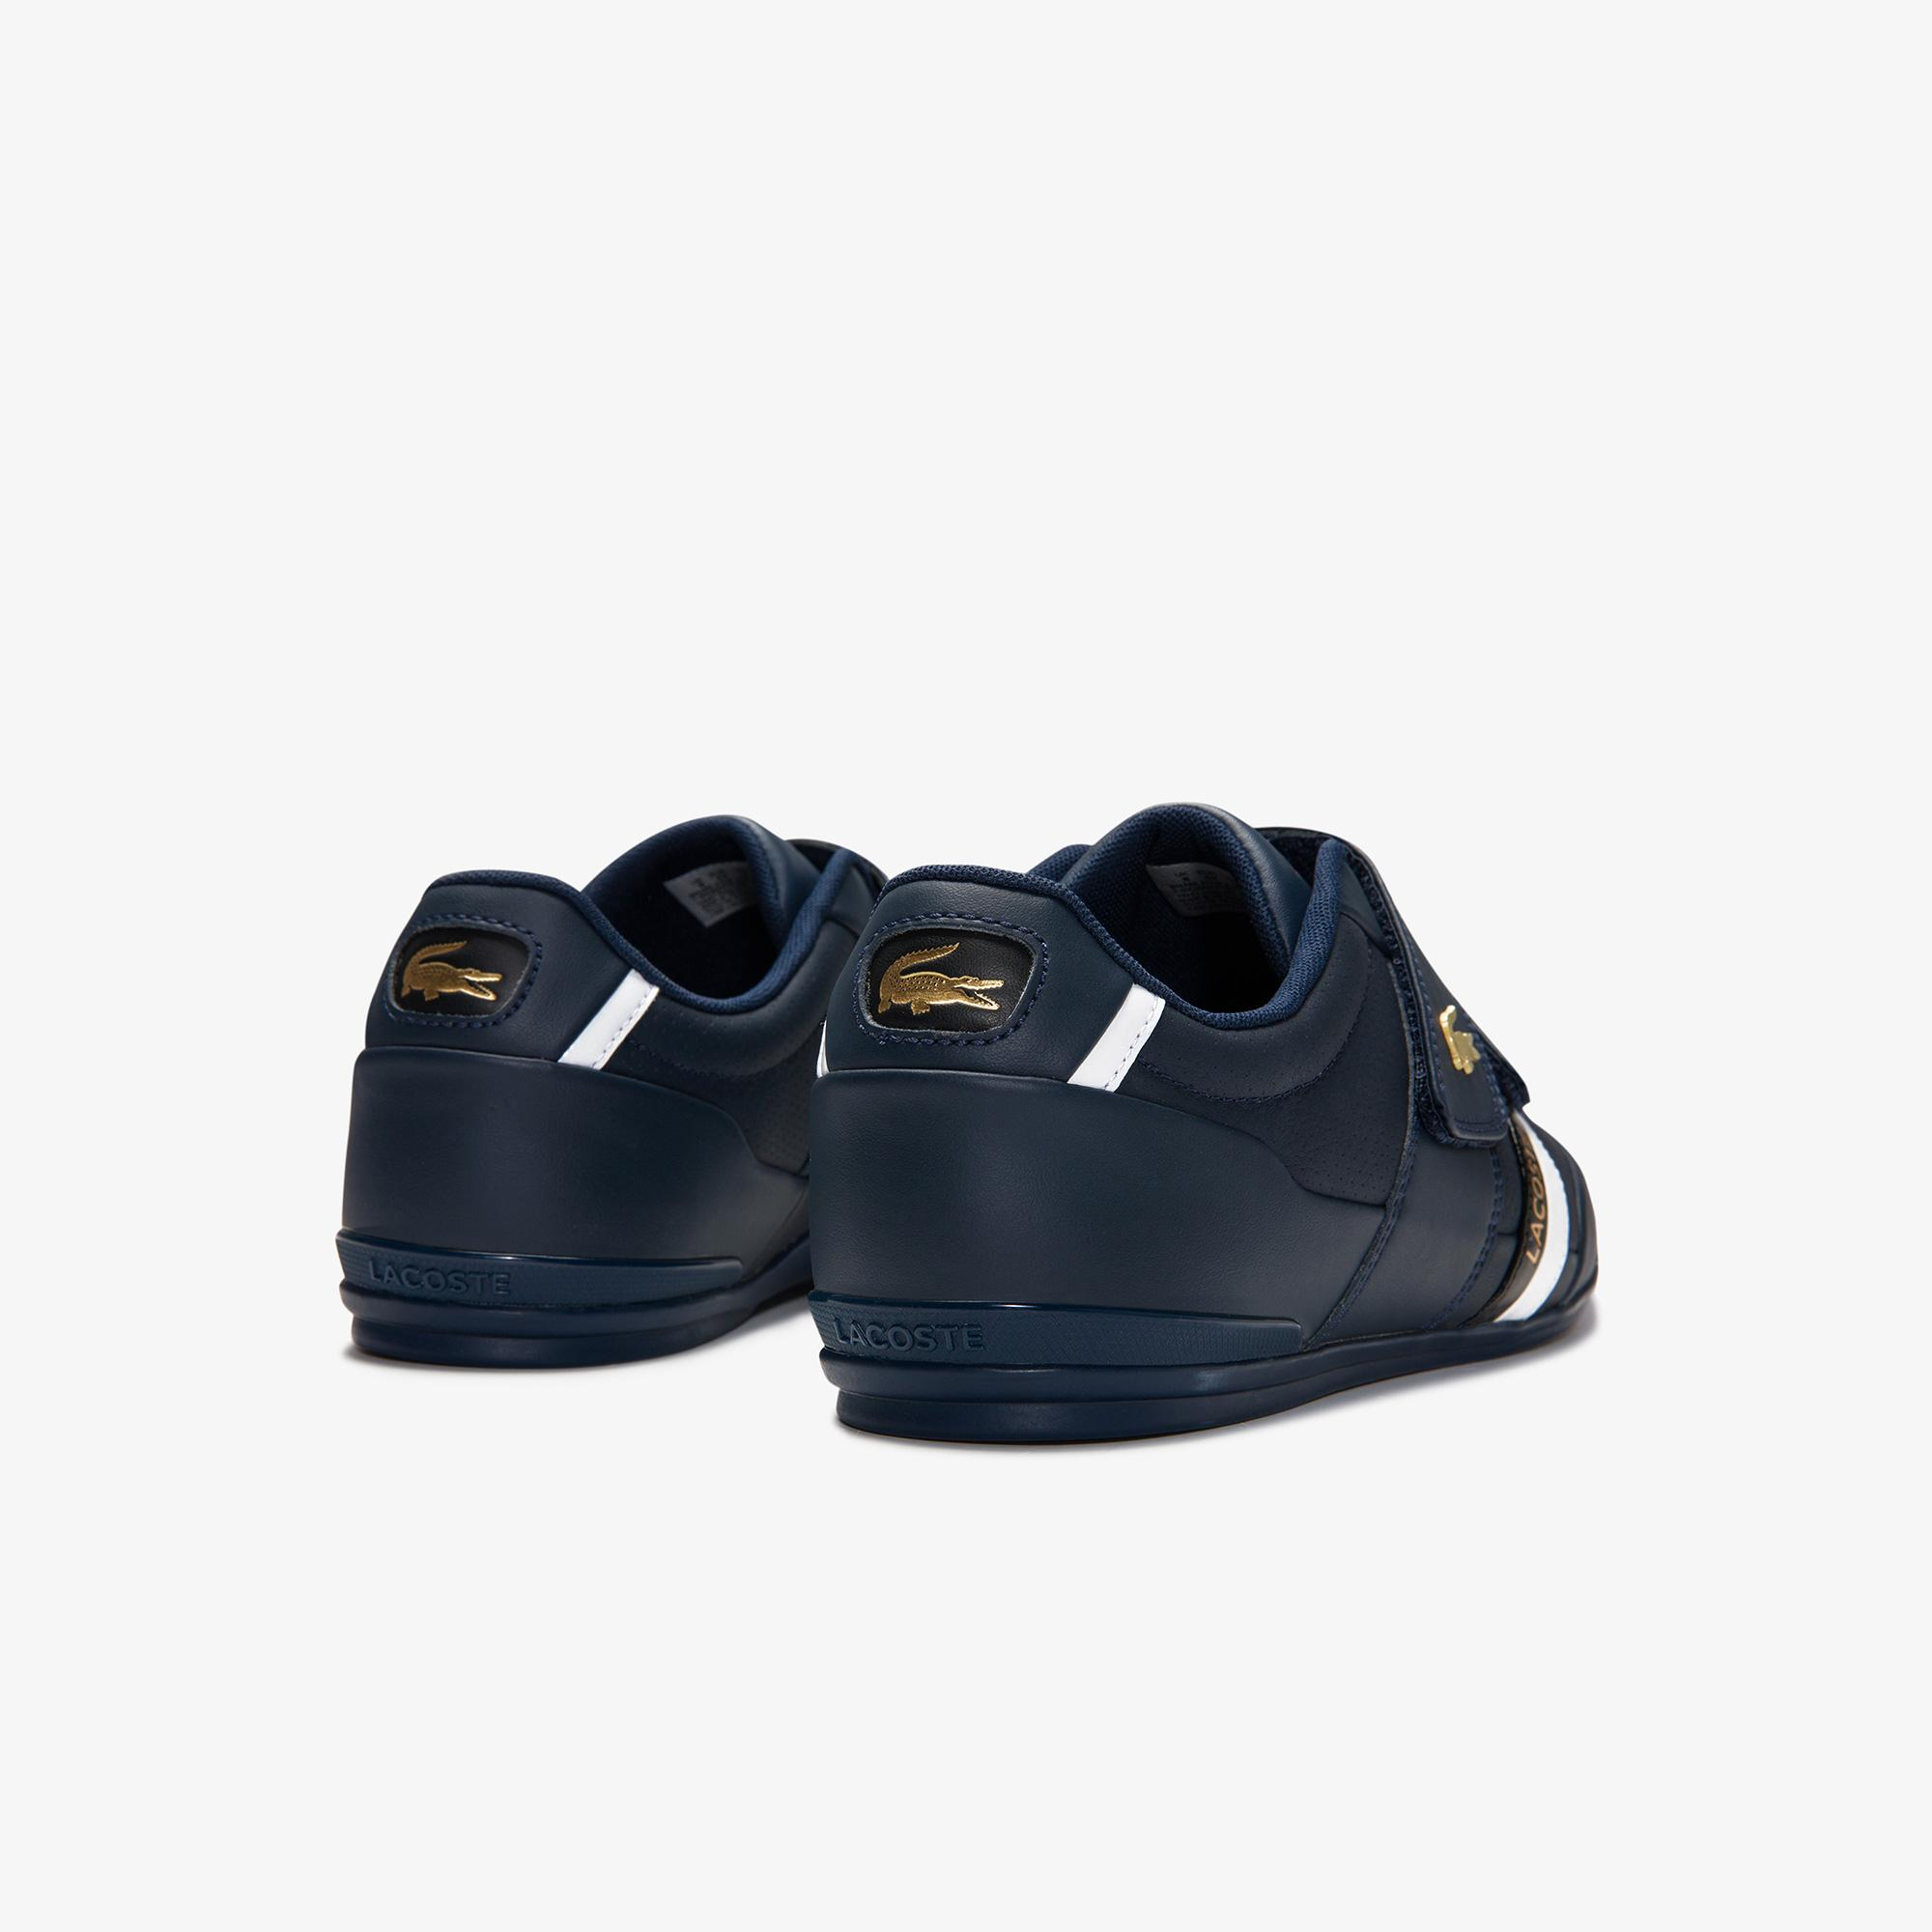 Lacoste Misano Strap 0120 1 Cma Erkek Lacivert - Siyah Sneaker